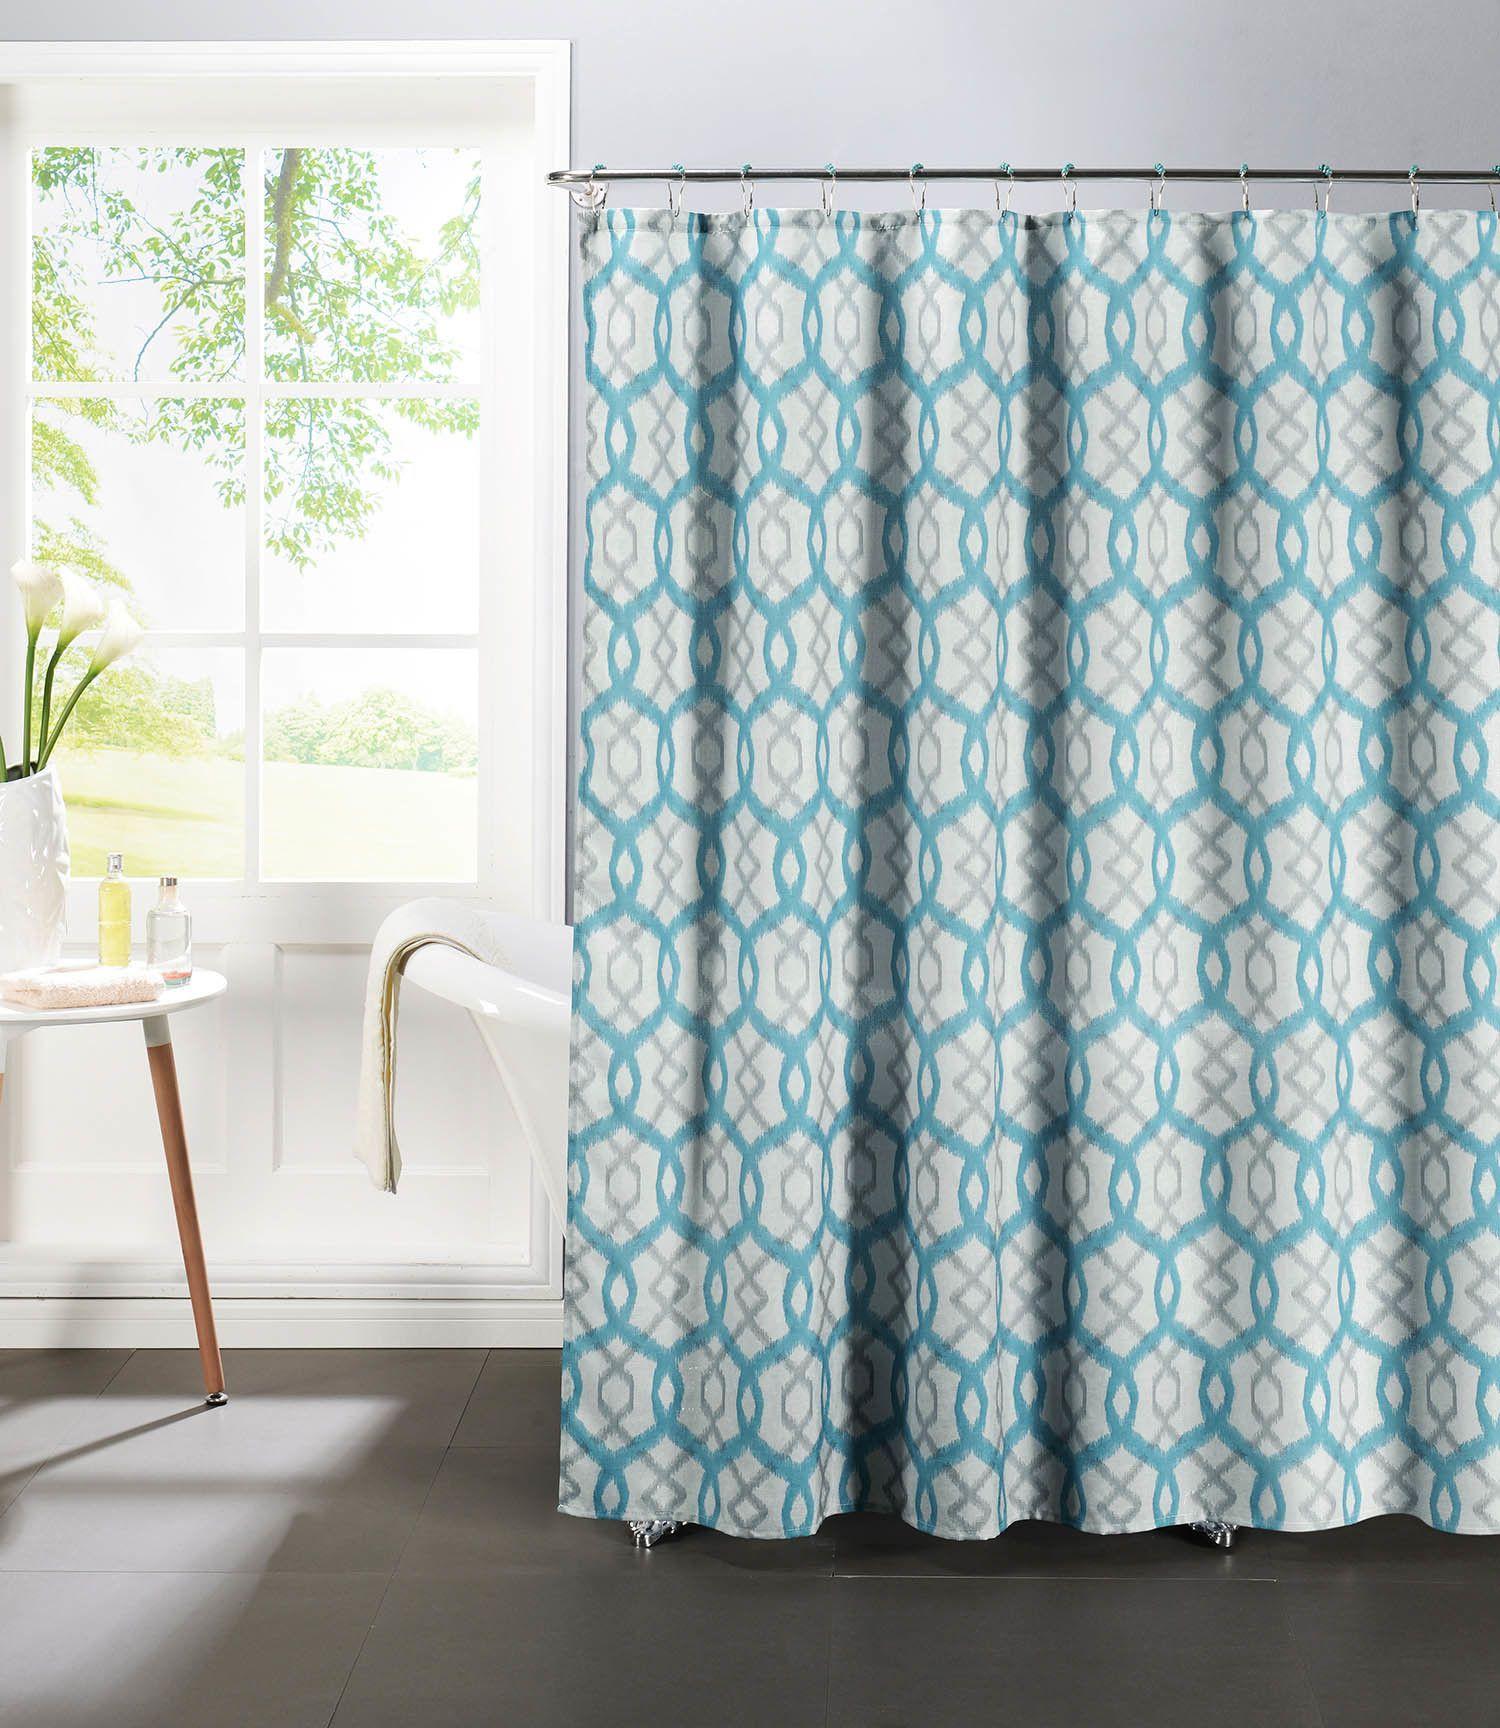 Ba bathroom curtains at sears - Faux 13 Piece Linen Textured Shower Curtain Set